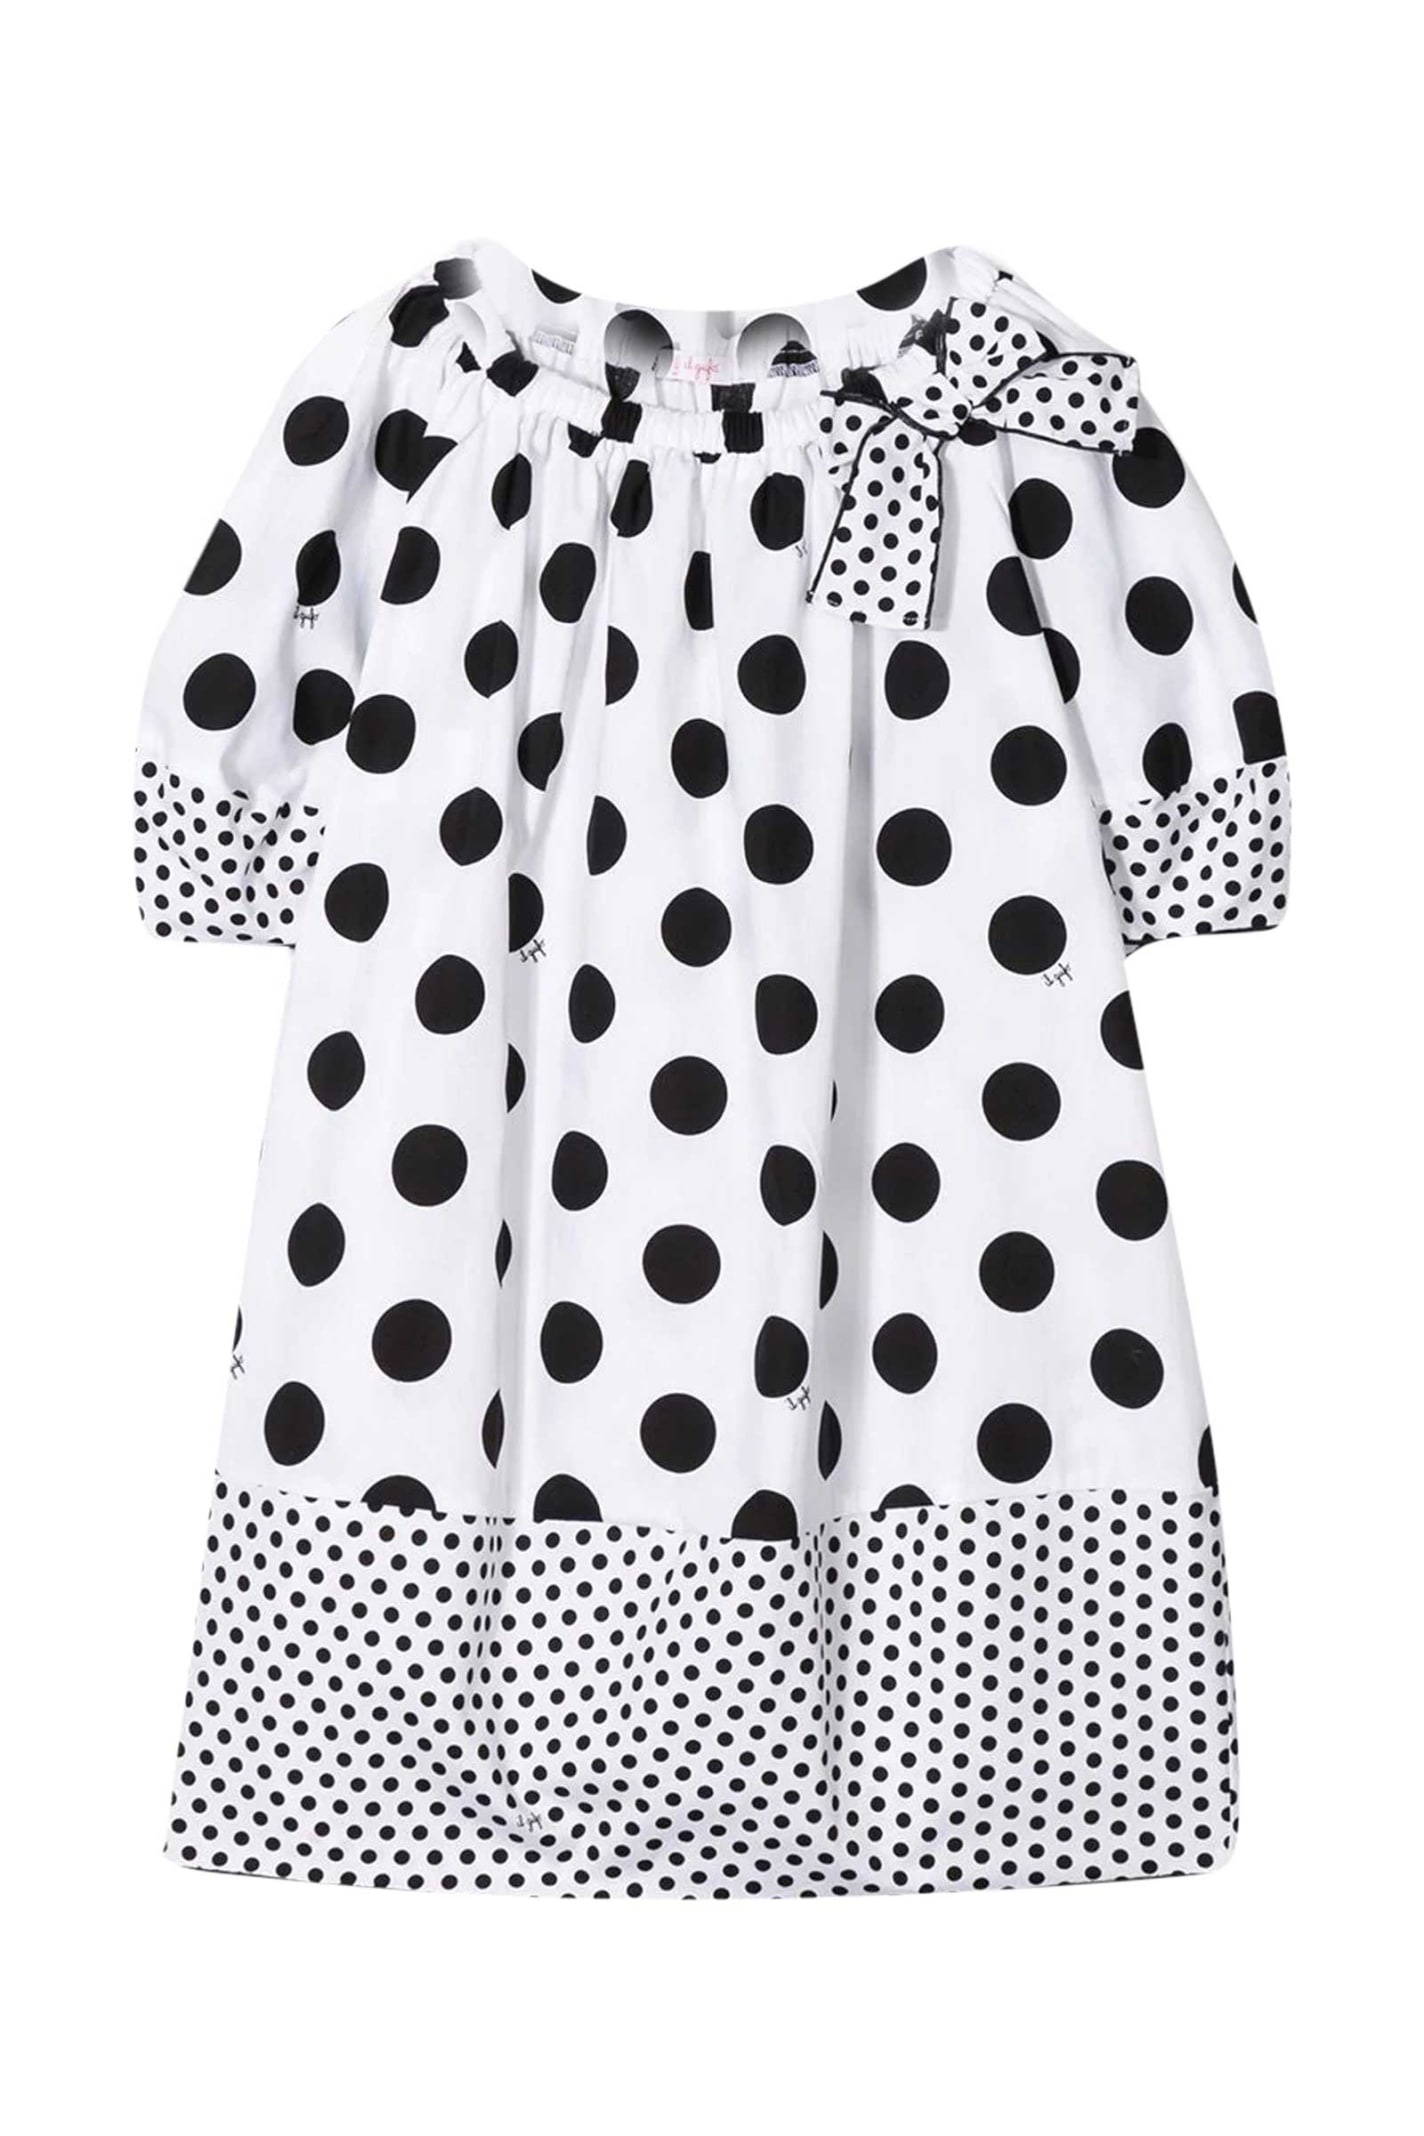 Buy Il Gufo Polka Dot Dress online, shop Il Gufo with free shipping